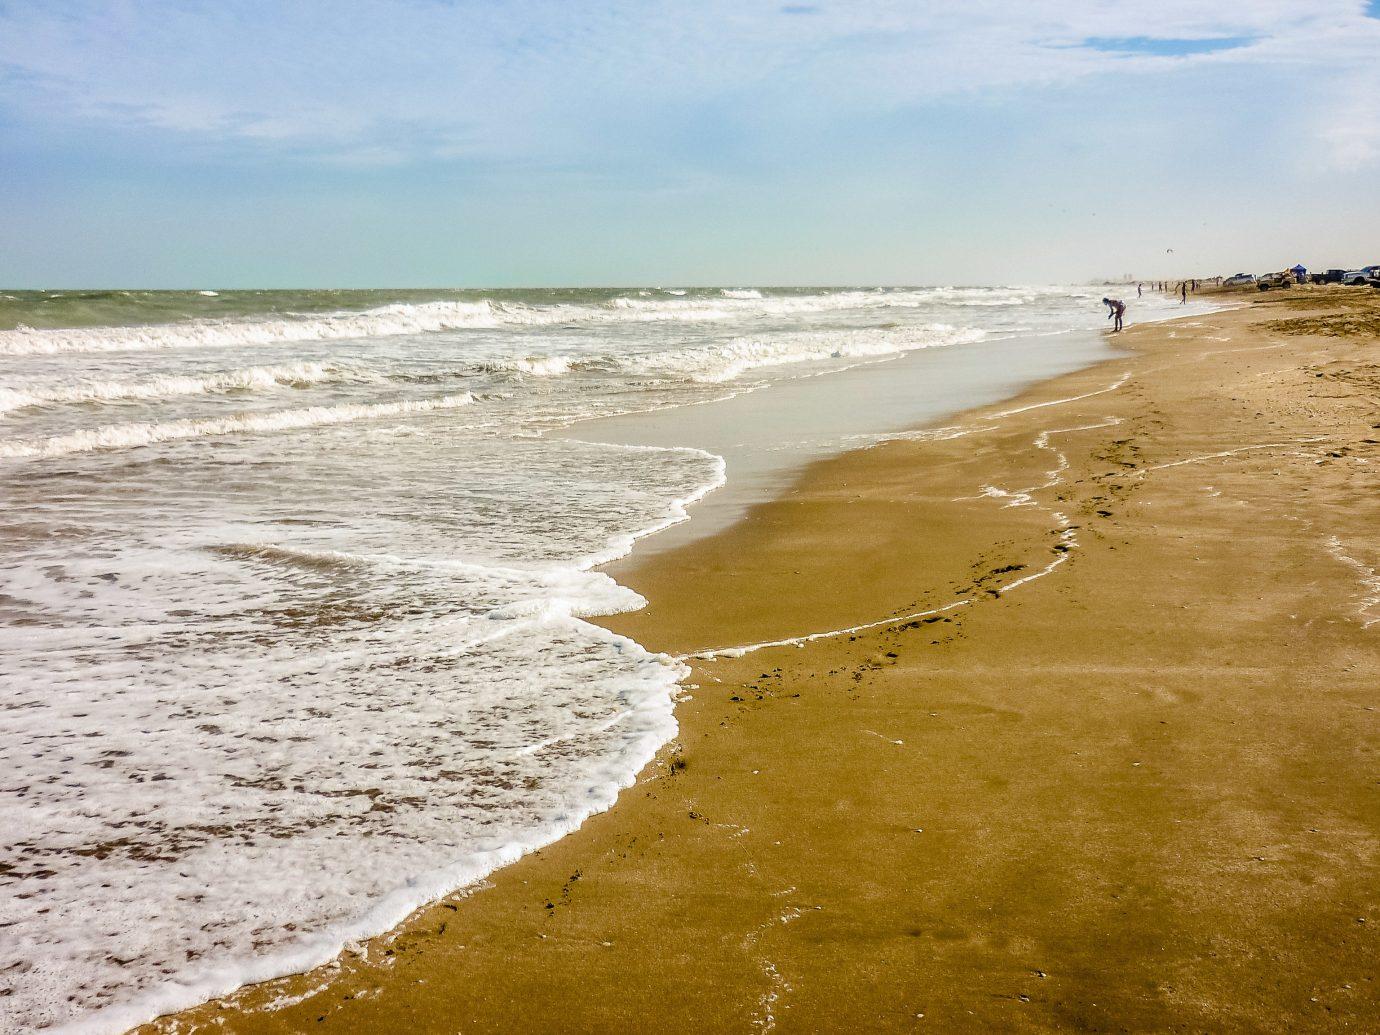 Trip Ideas outdoor sky Beach water shore Nature Sea body of water Coast coastal and oceanic landforms Ocean wave sand wind wave horizon cloud tide sandy